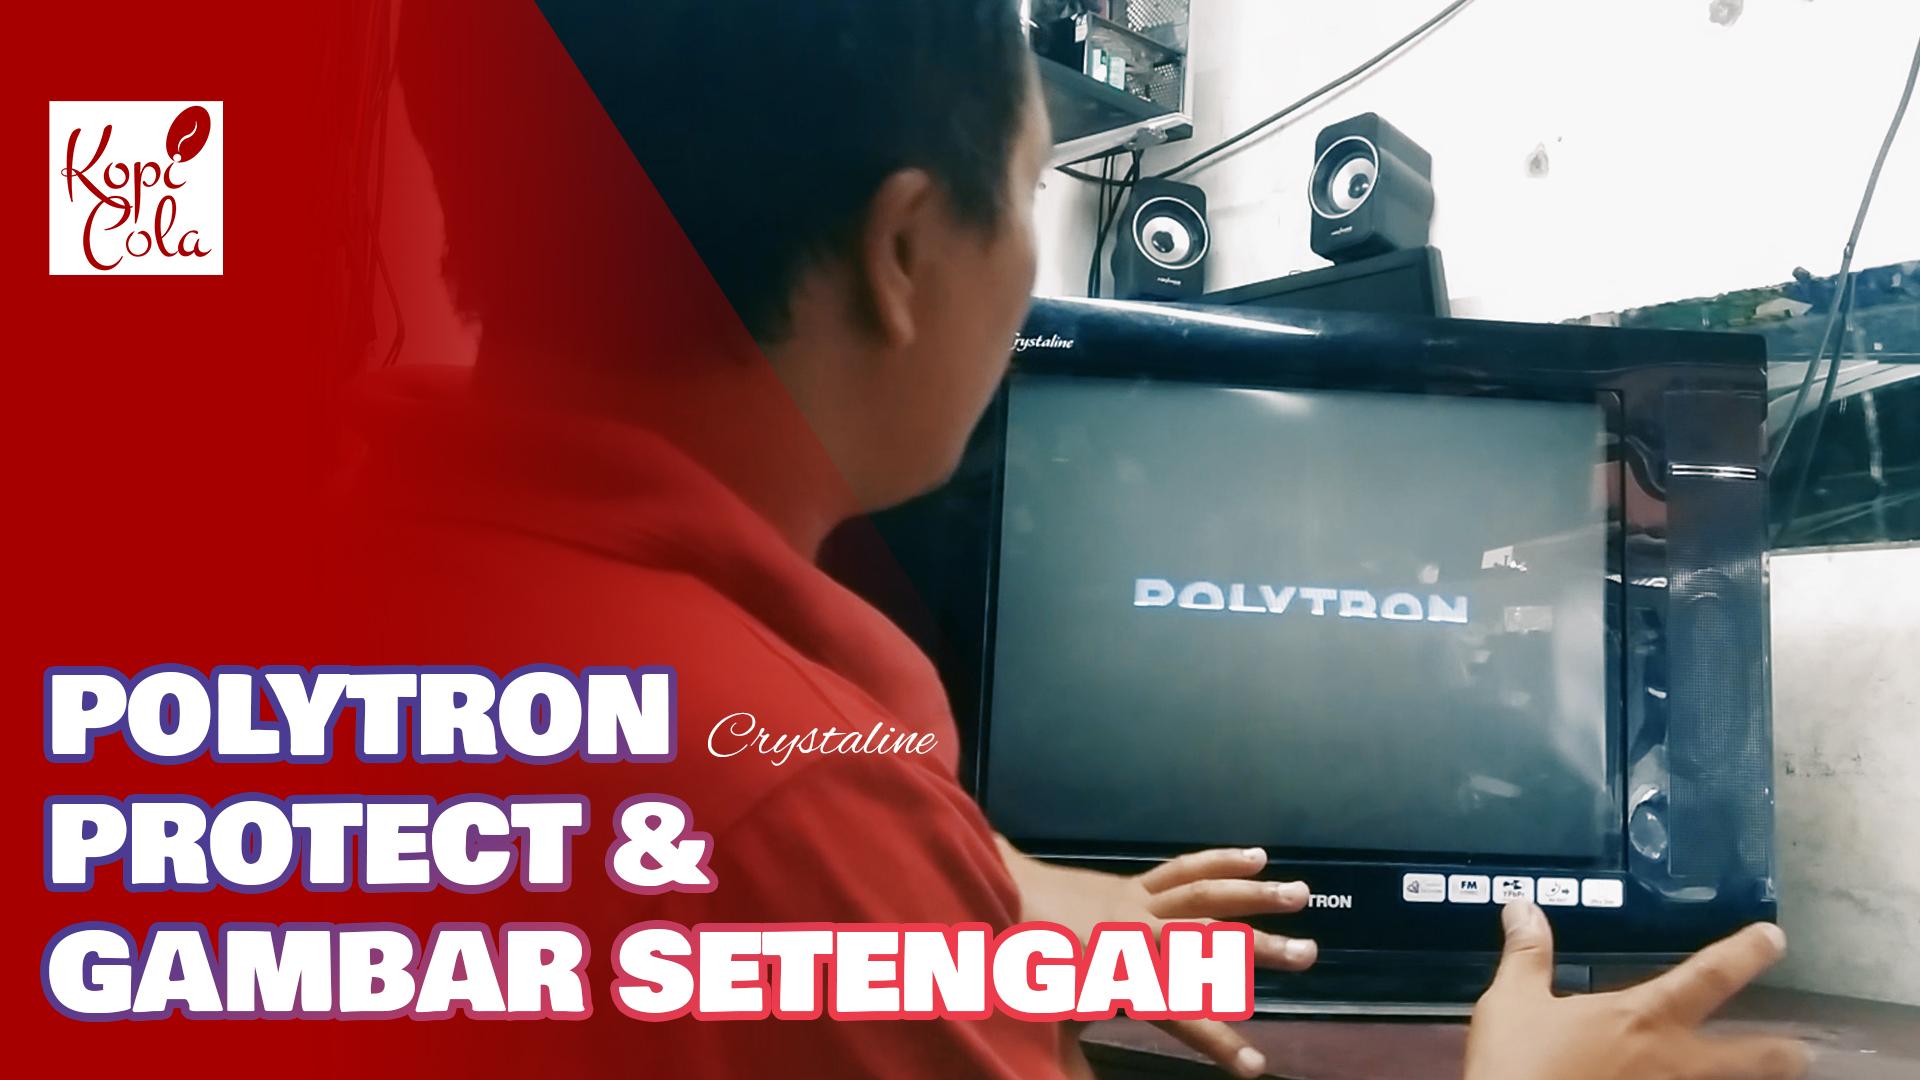 "Memperbaiki TV Polytron Crystaline 21"" Protect & Gambar Separuh (Gambar Setengah) Tanpa Tester"